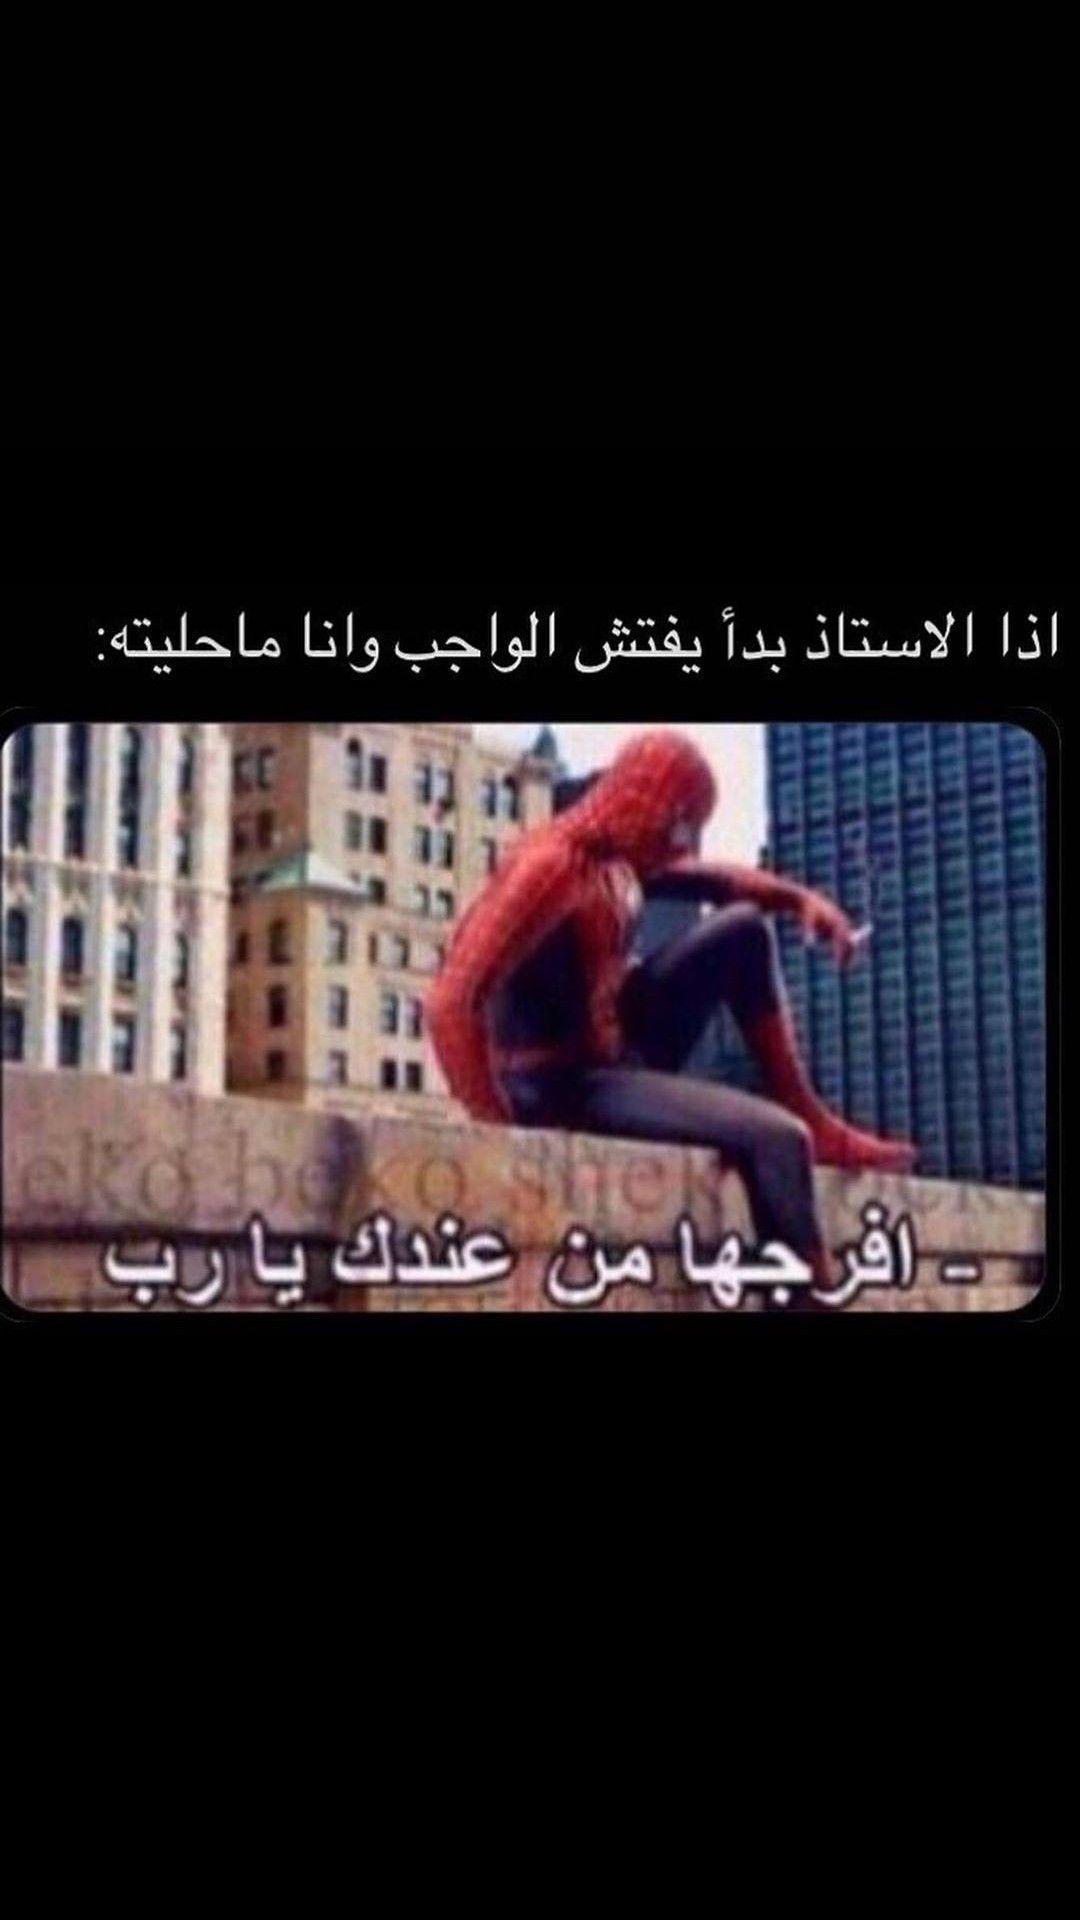 حرفيا Follow Me Please Fun Funny Jokes Meme Faces Arabic Funny